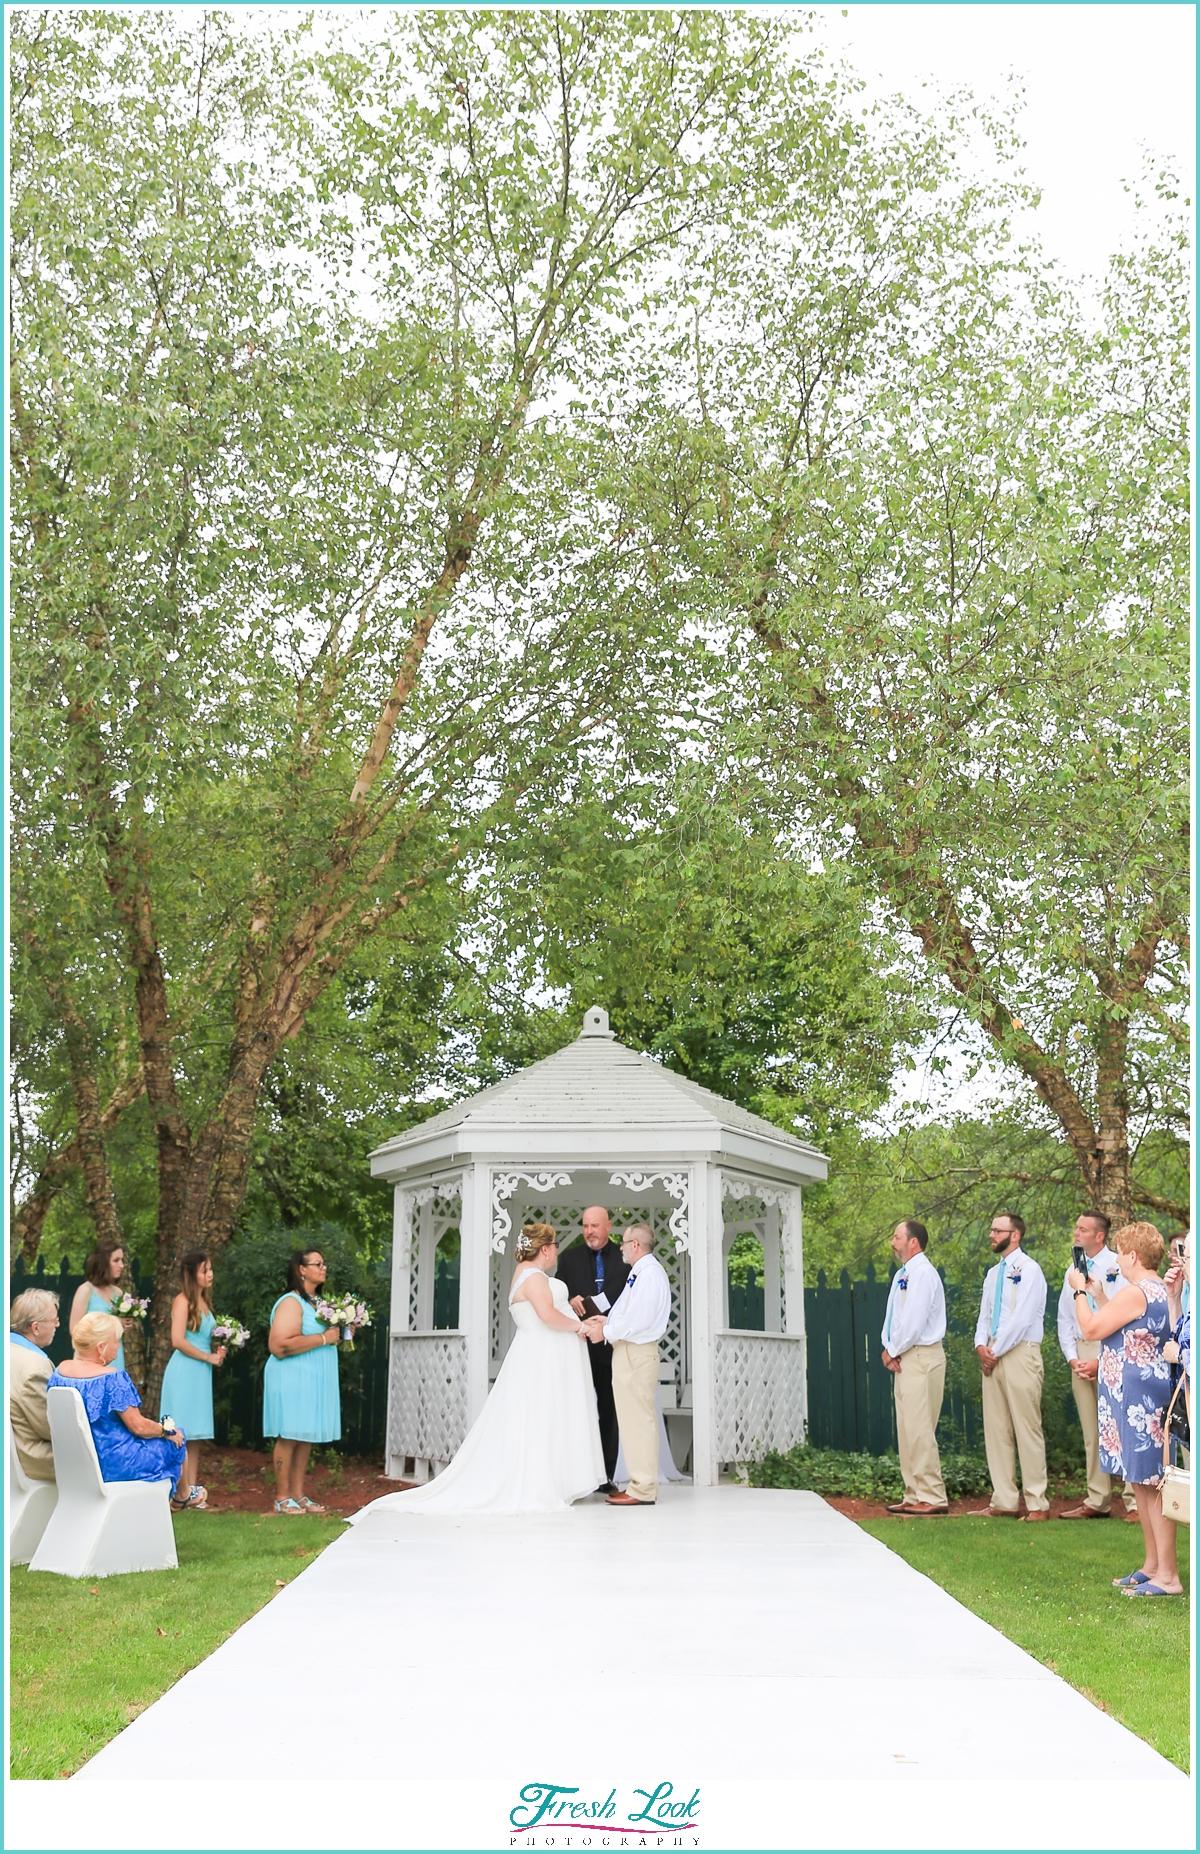 Chesapeake Golf Club wedding ceremony